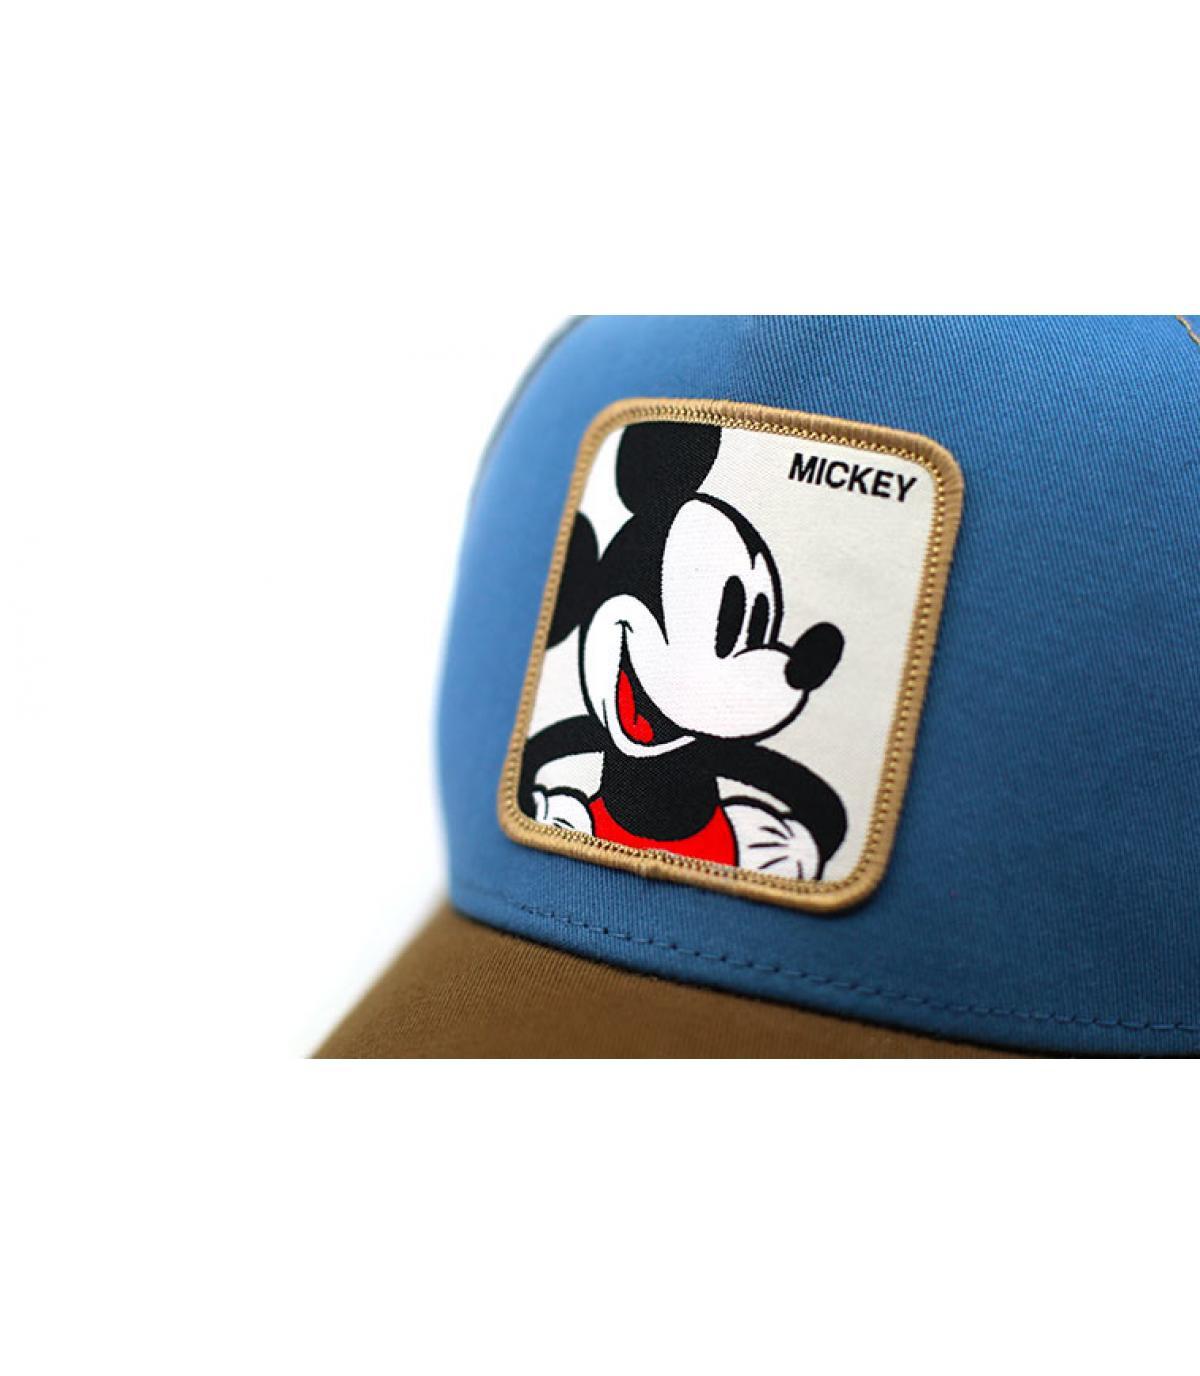 Détails Trucker Mickey - image 3